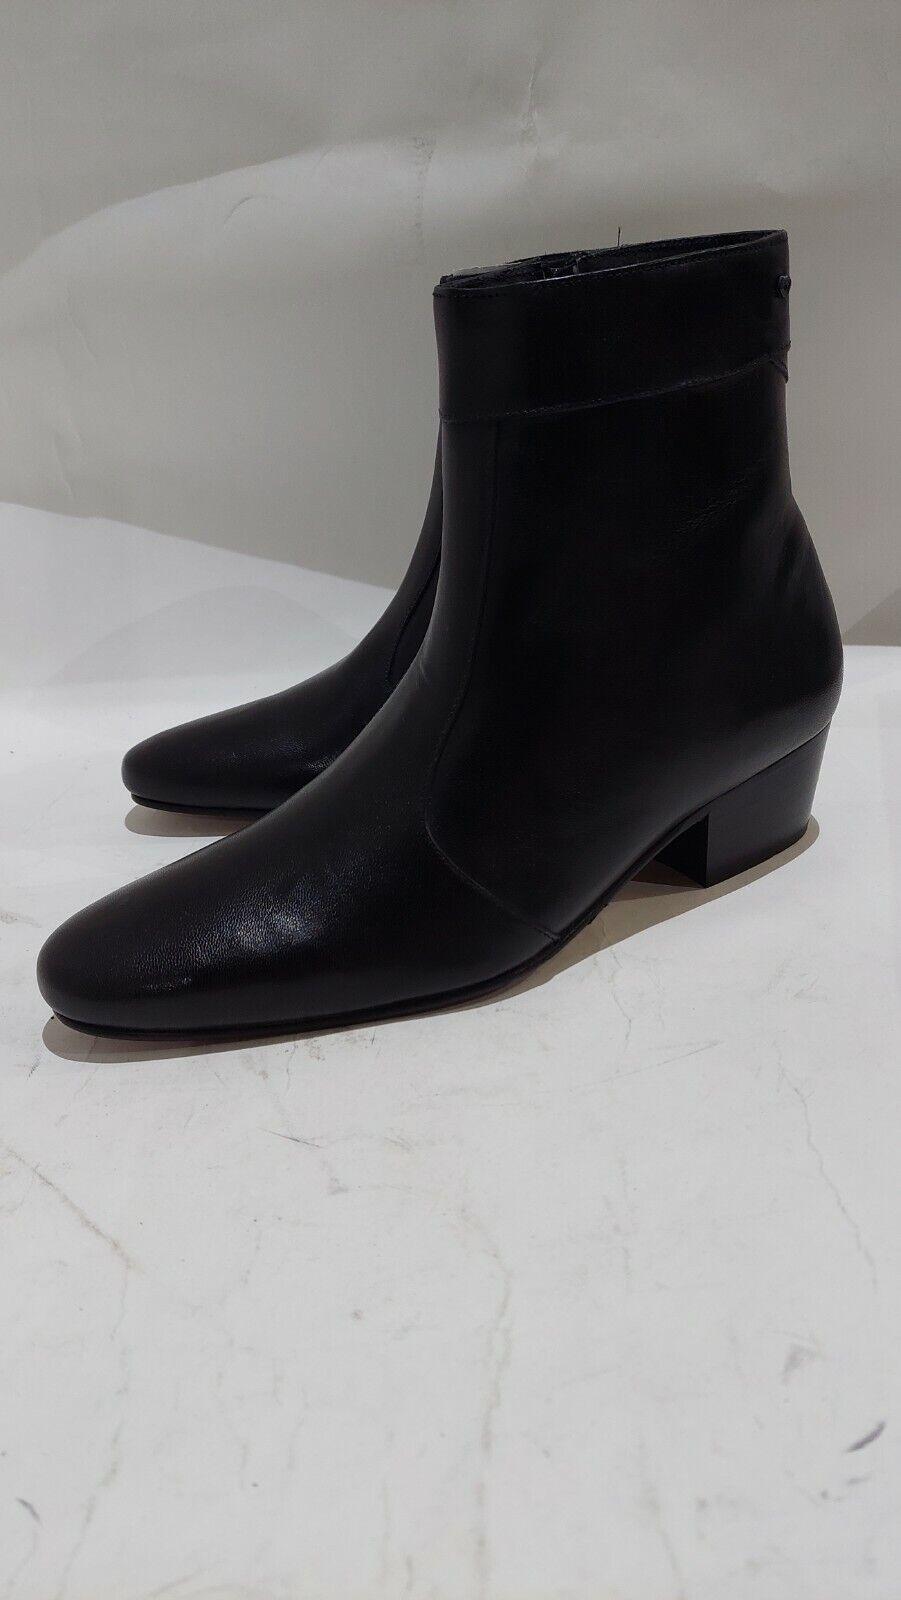 Club Cubano CAESAR Mens Premium Leather Heel Ankle Boots Black Uk8 #418